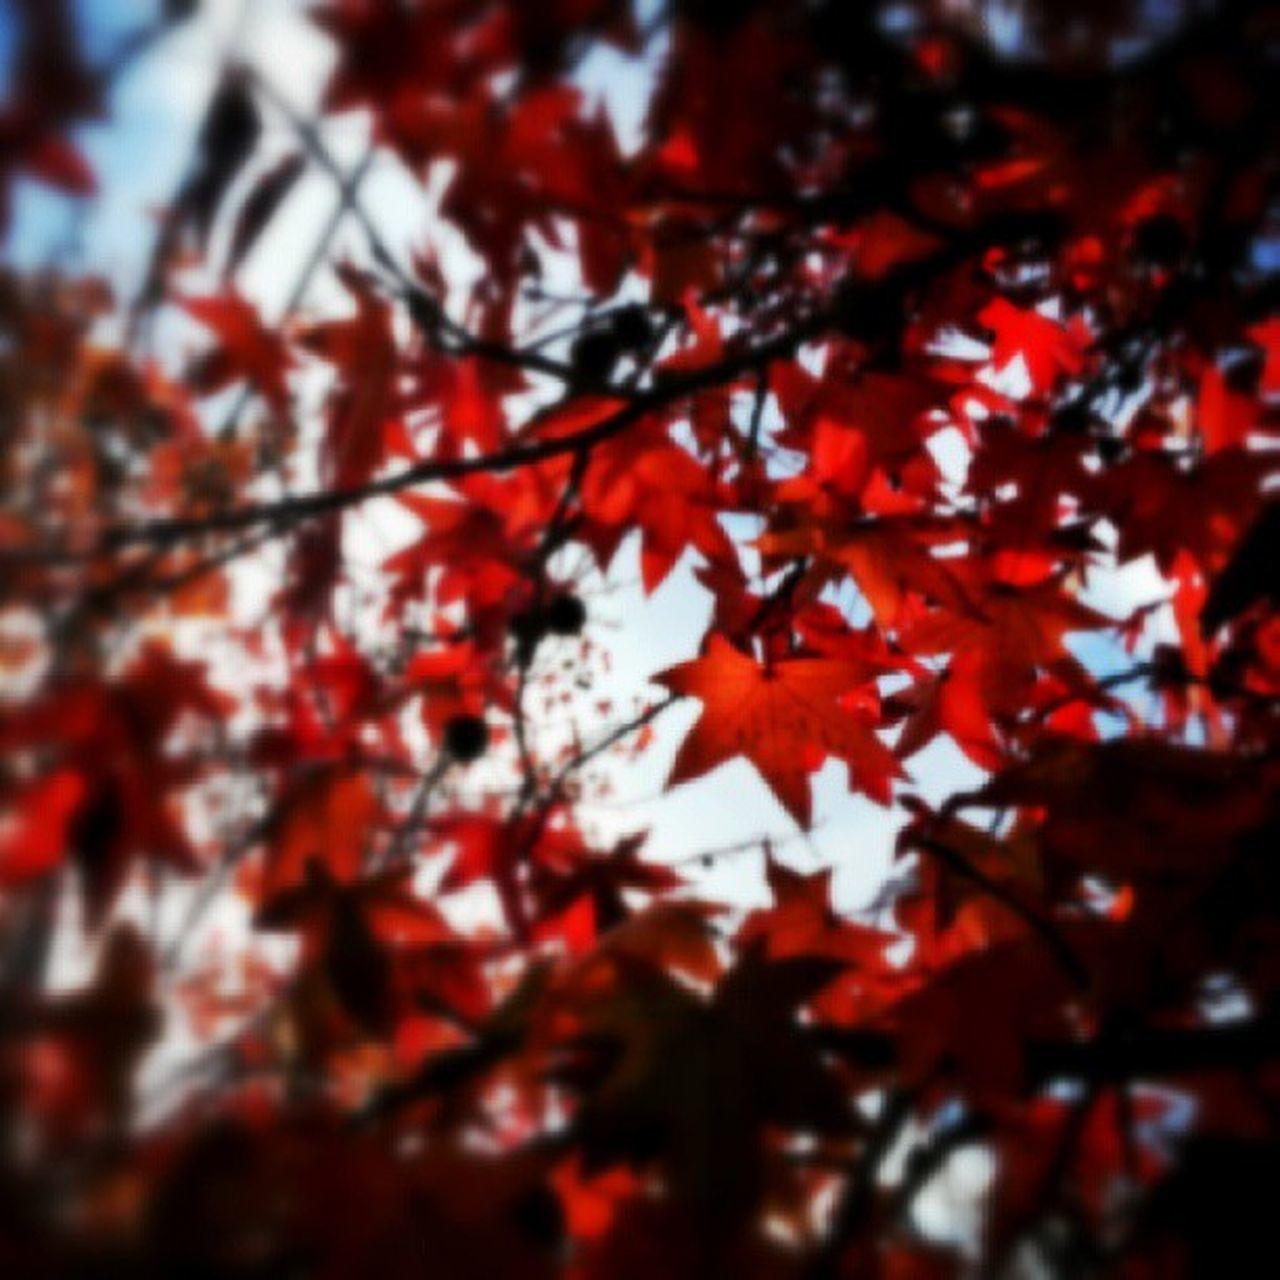 Igersbsas Bsassinfoco Red Otoño Nature Naturaleza